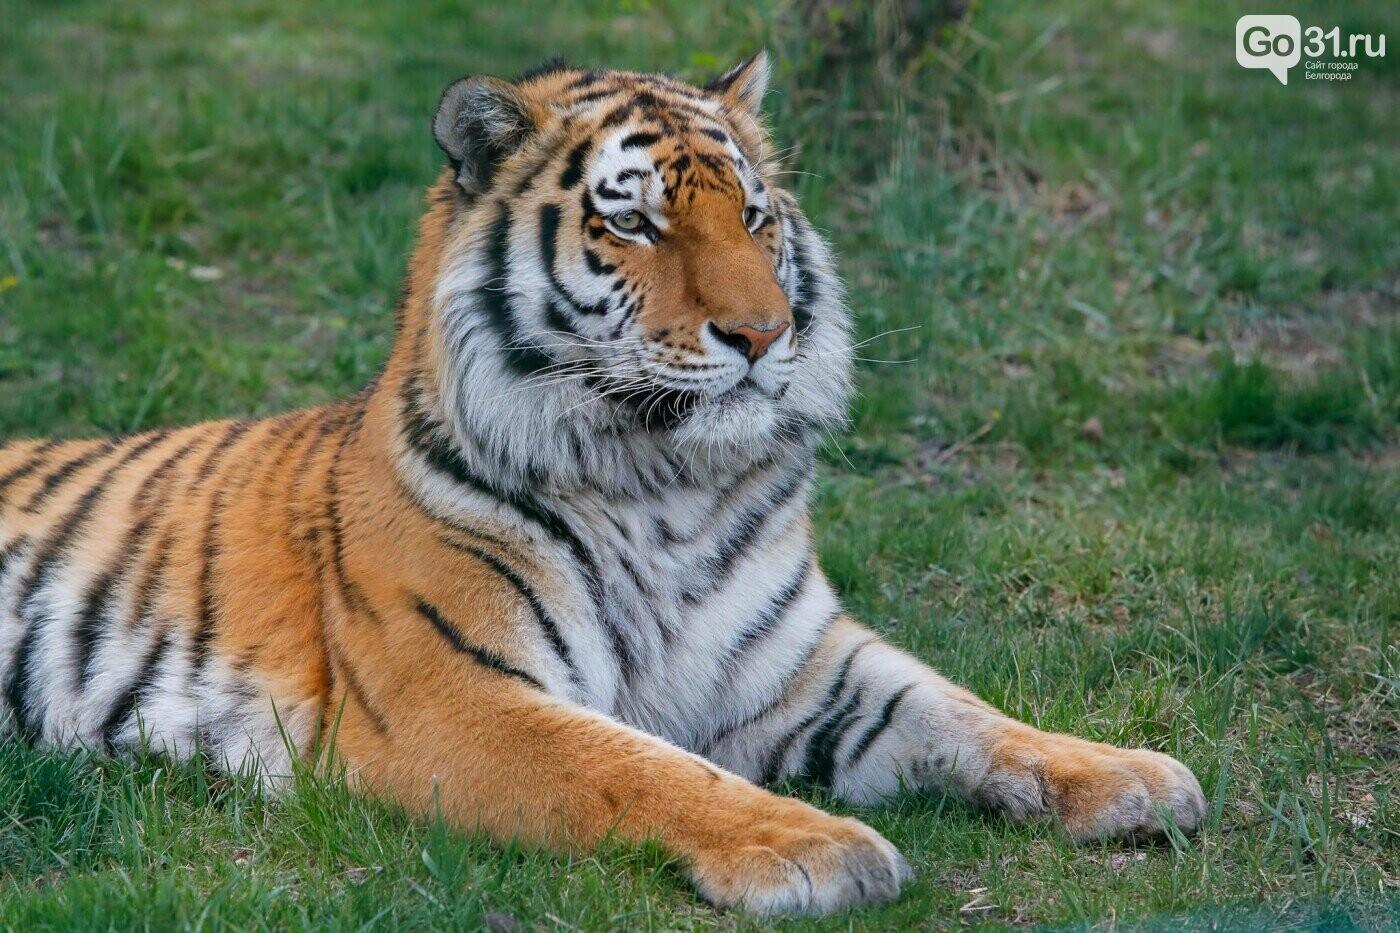 Тигр в Белгородском зоопарке, Фото: Антон Вергун